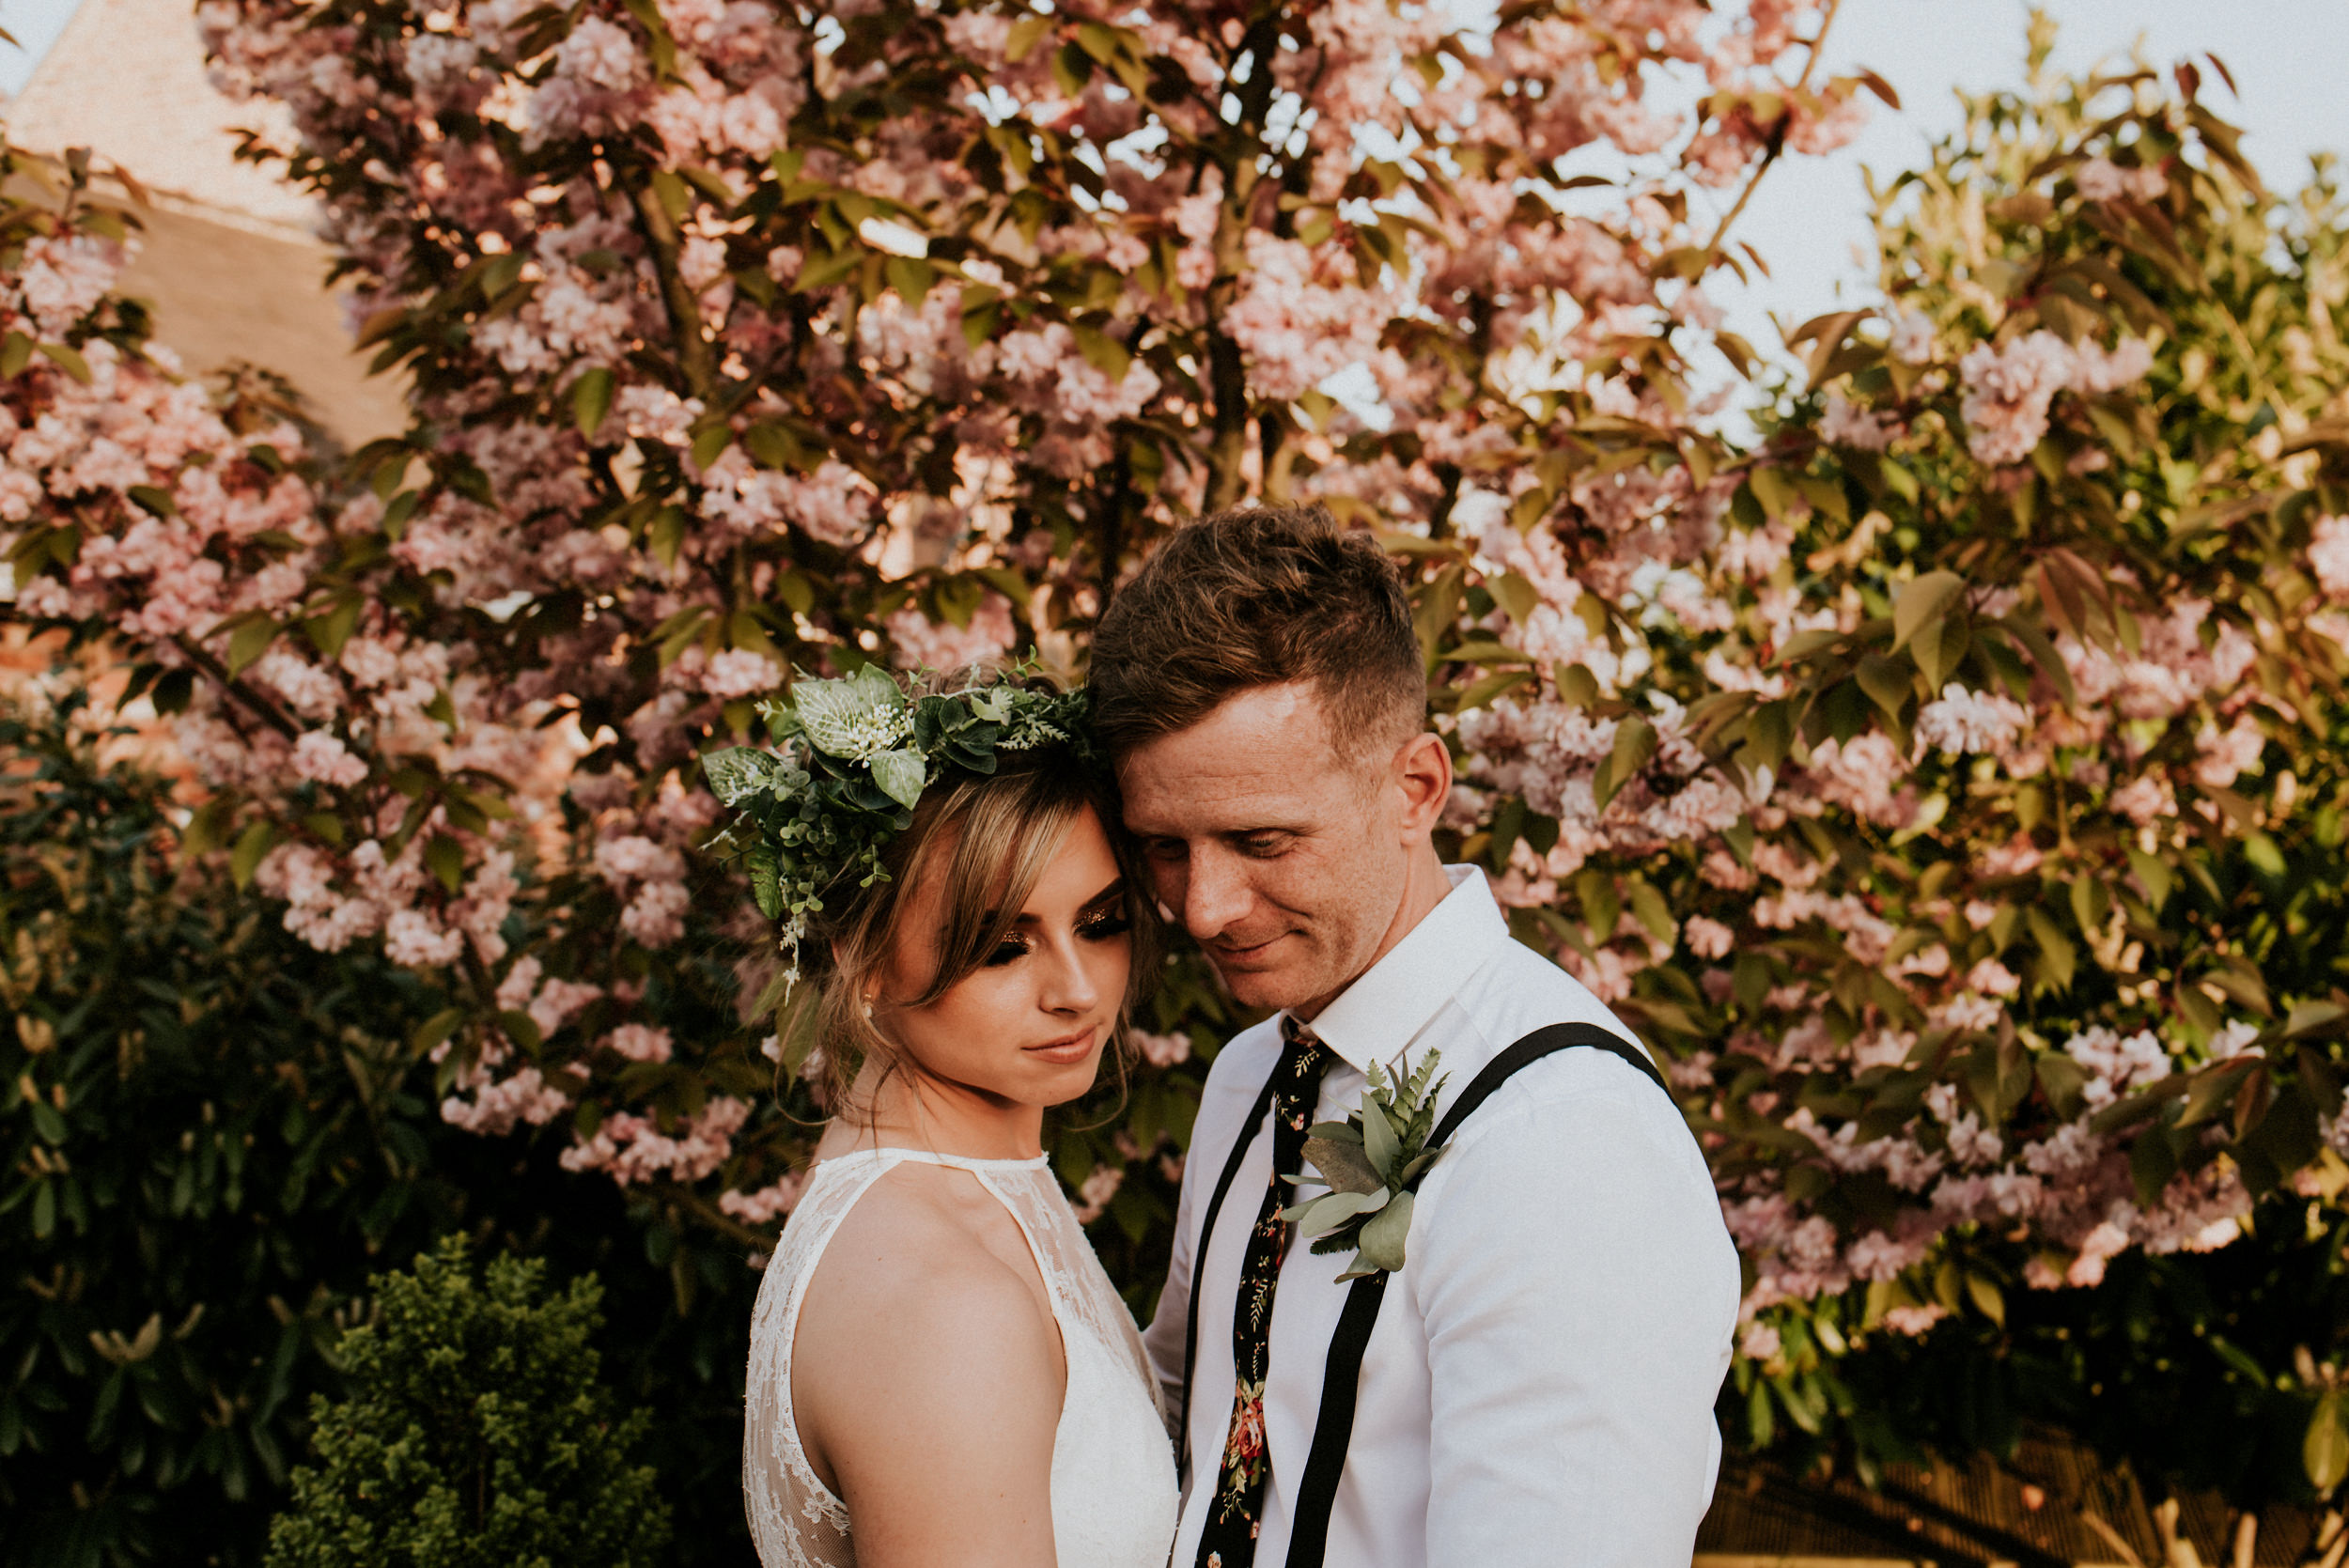 NAOMI & ALEX - SWANCAR FARM COUNTRY HOUSE, NOTTINGHAM WEDDING